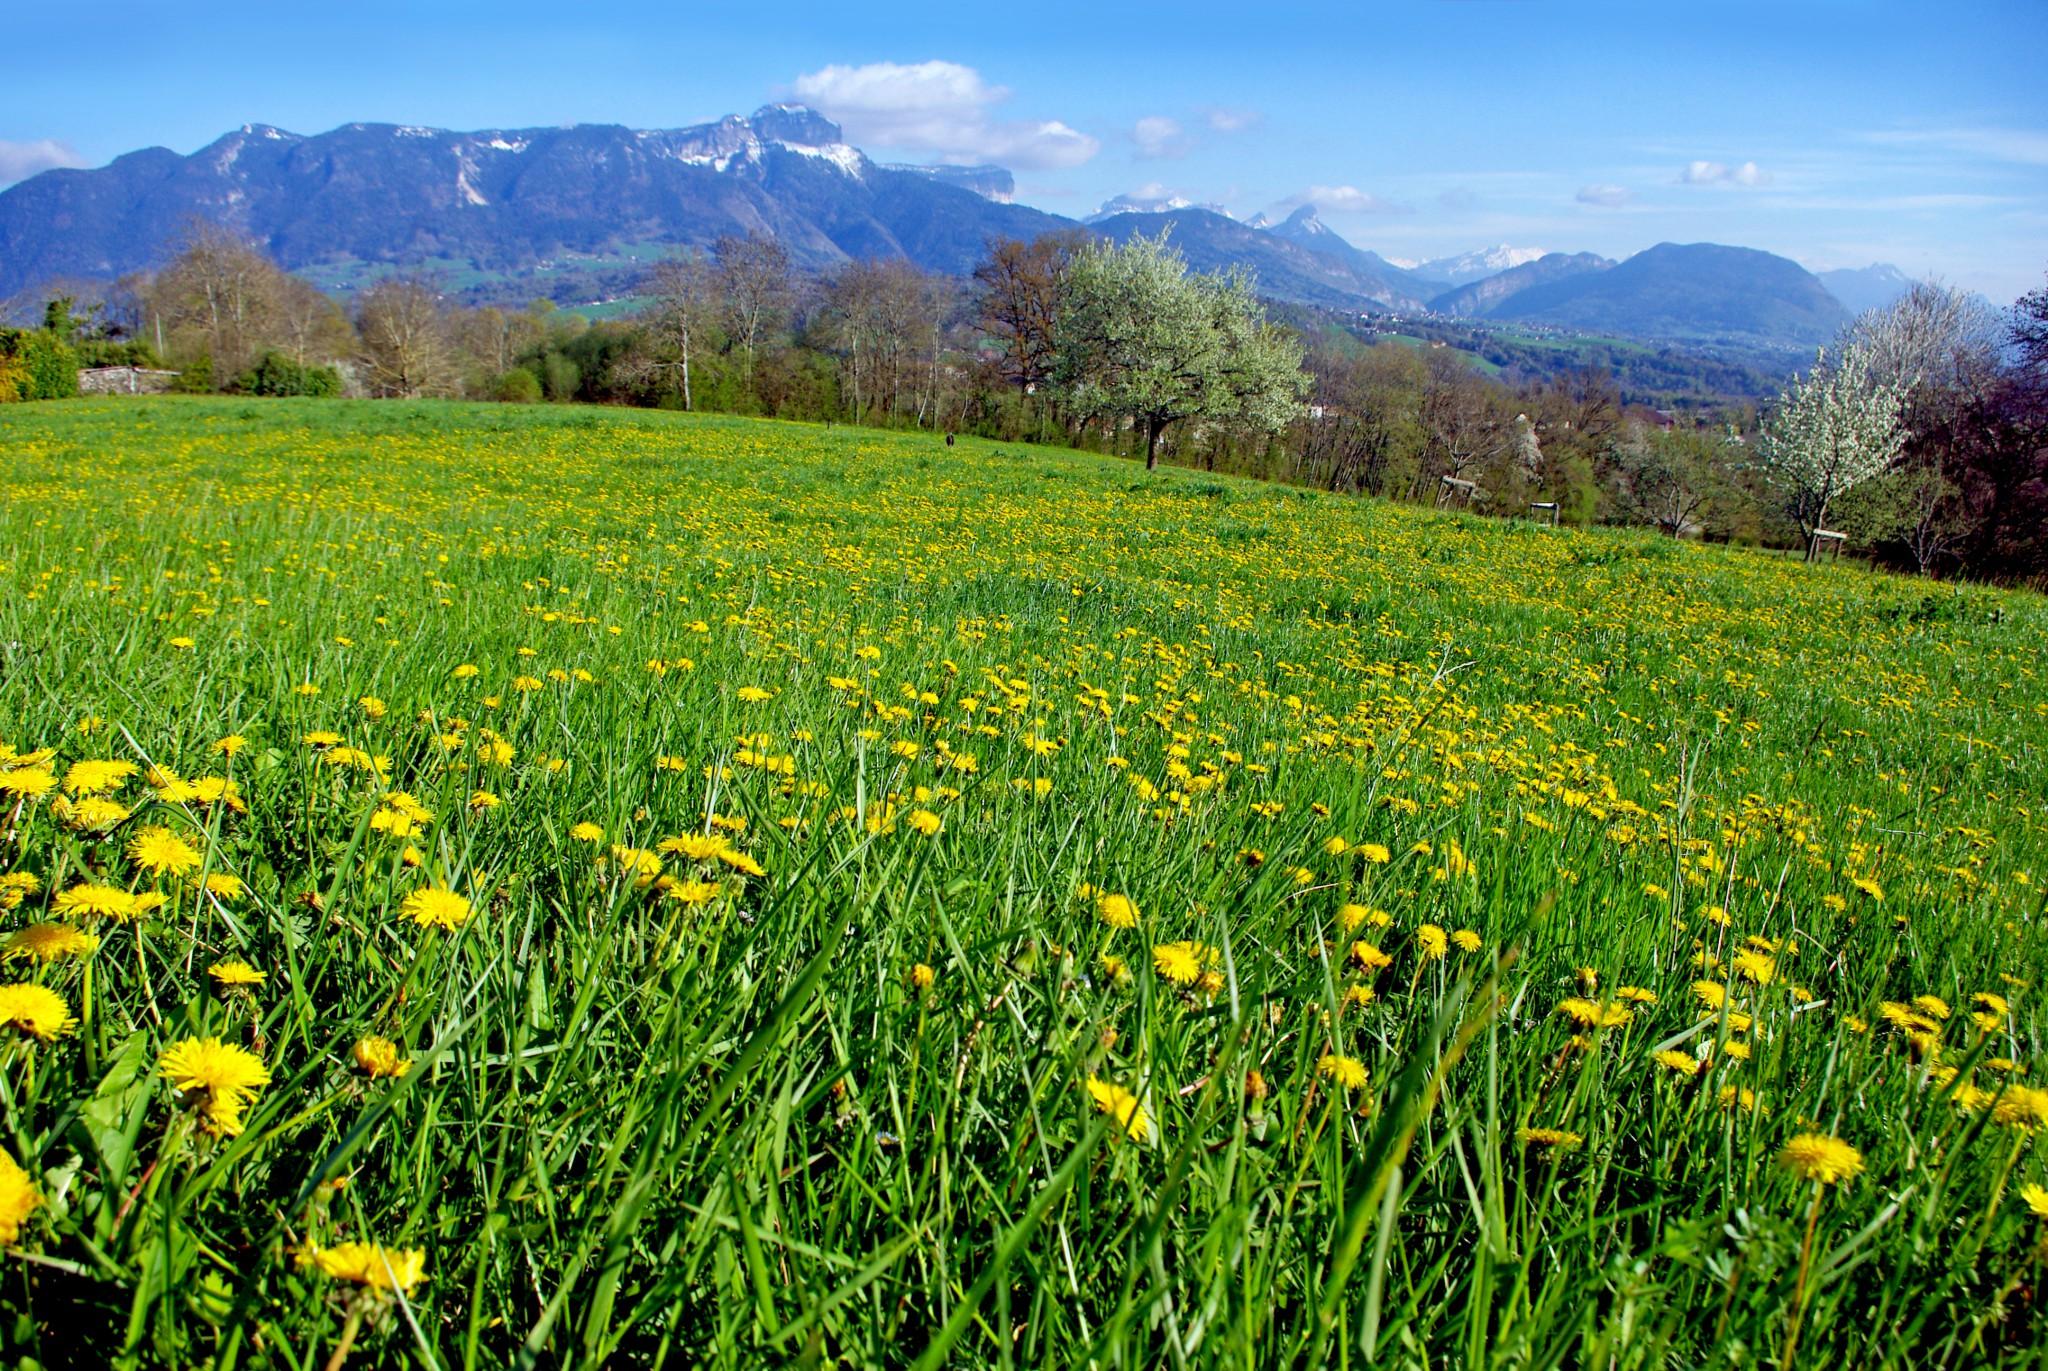 Field in Groisy Haute-Savoie © French Moments